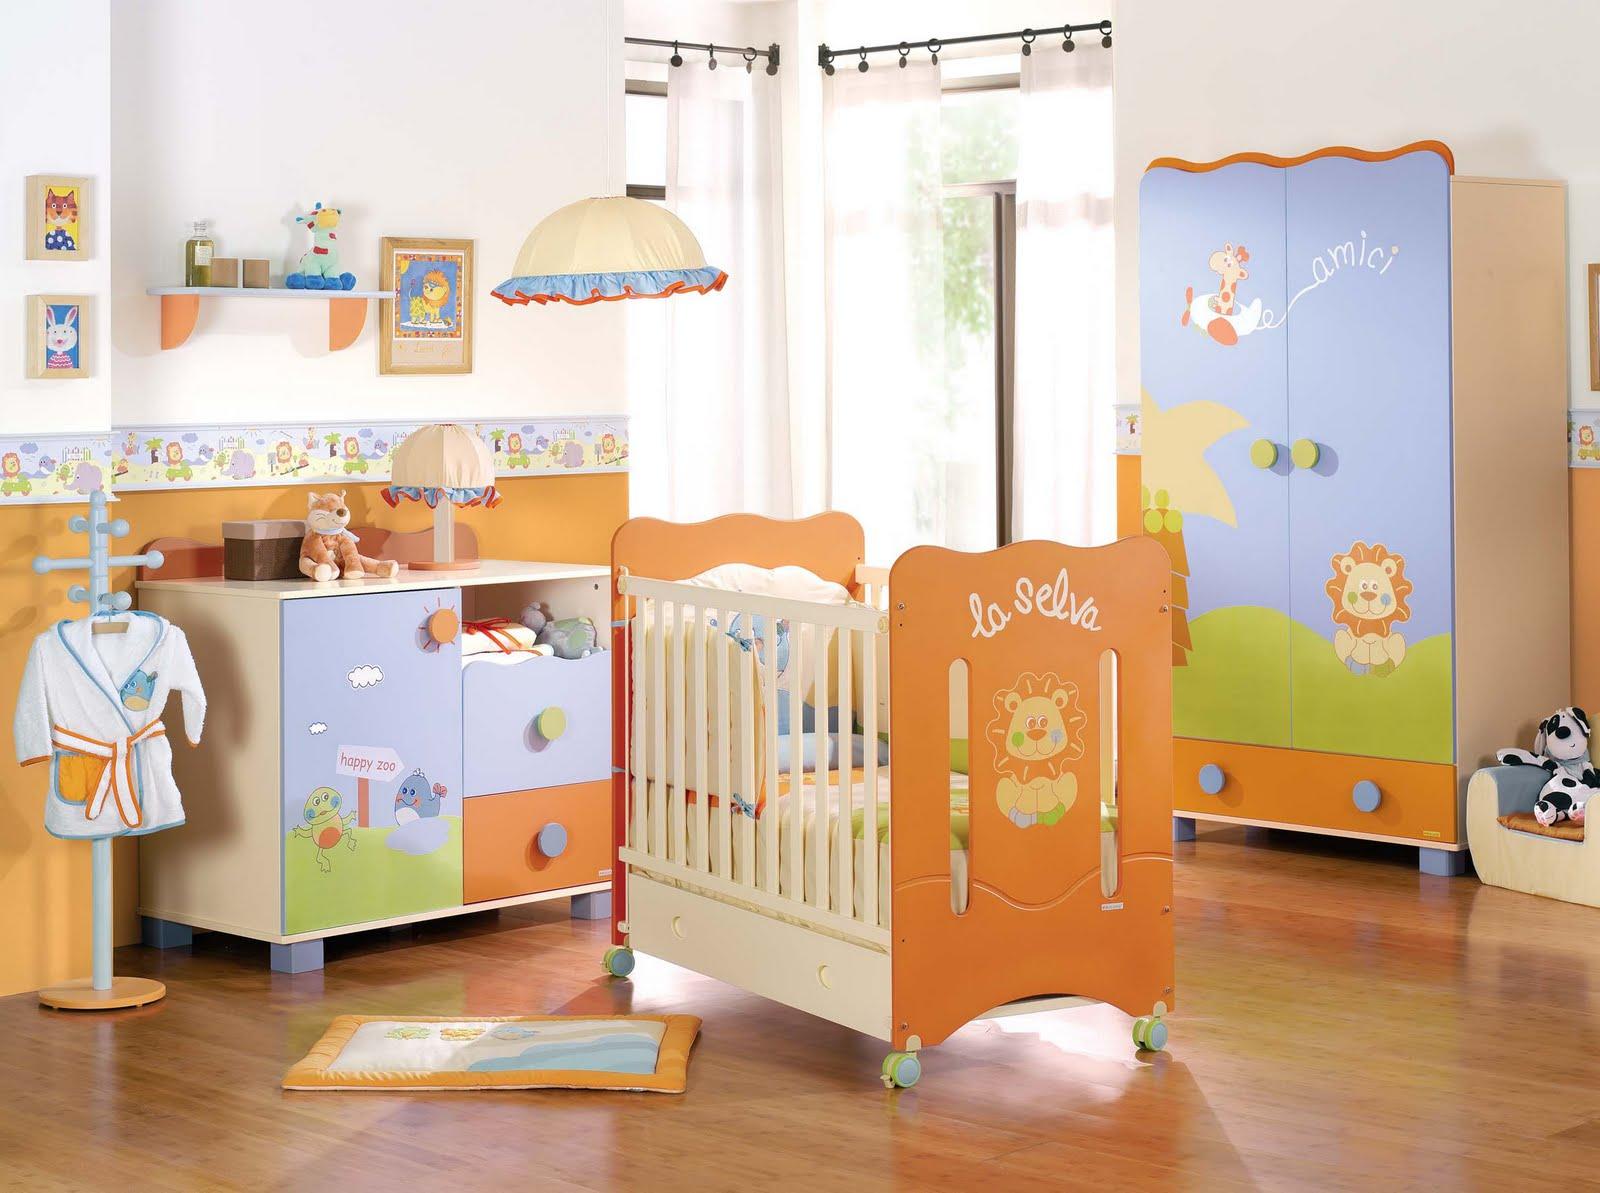 Mobiliario bebe online mobiliario juvenil infantil crian a - Mobiliario on line ...